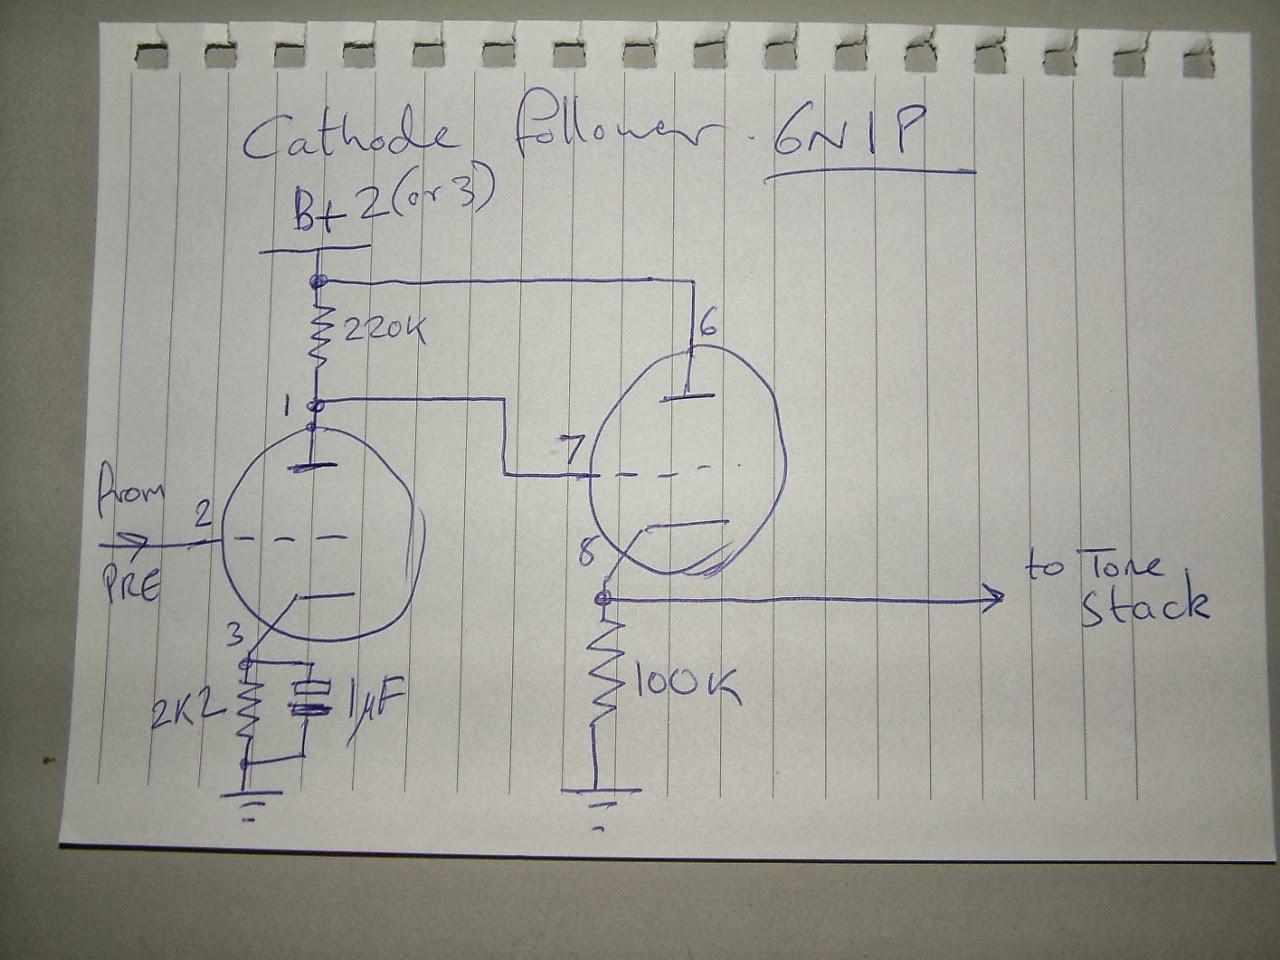 Charmant Mf35 Schaltplan Fotos - Elektrische Schaltplan-Ideen ...